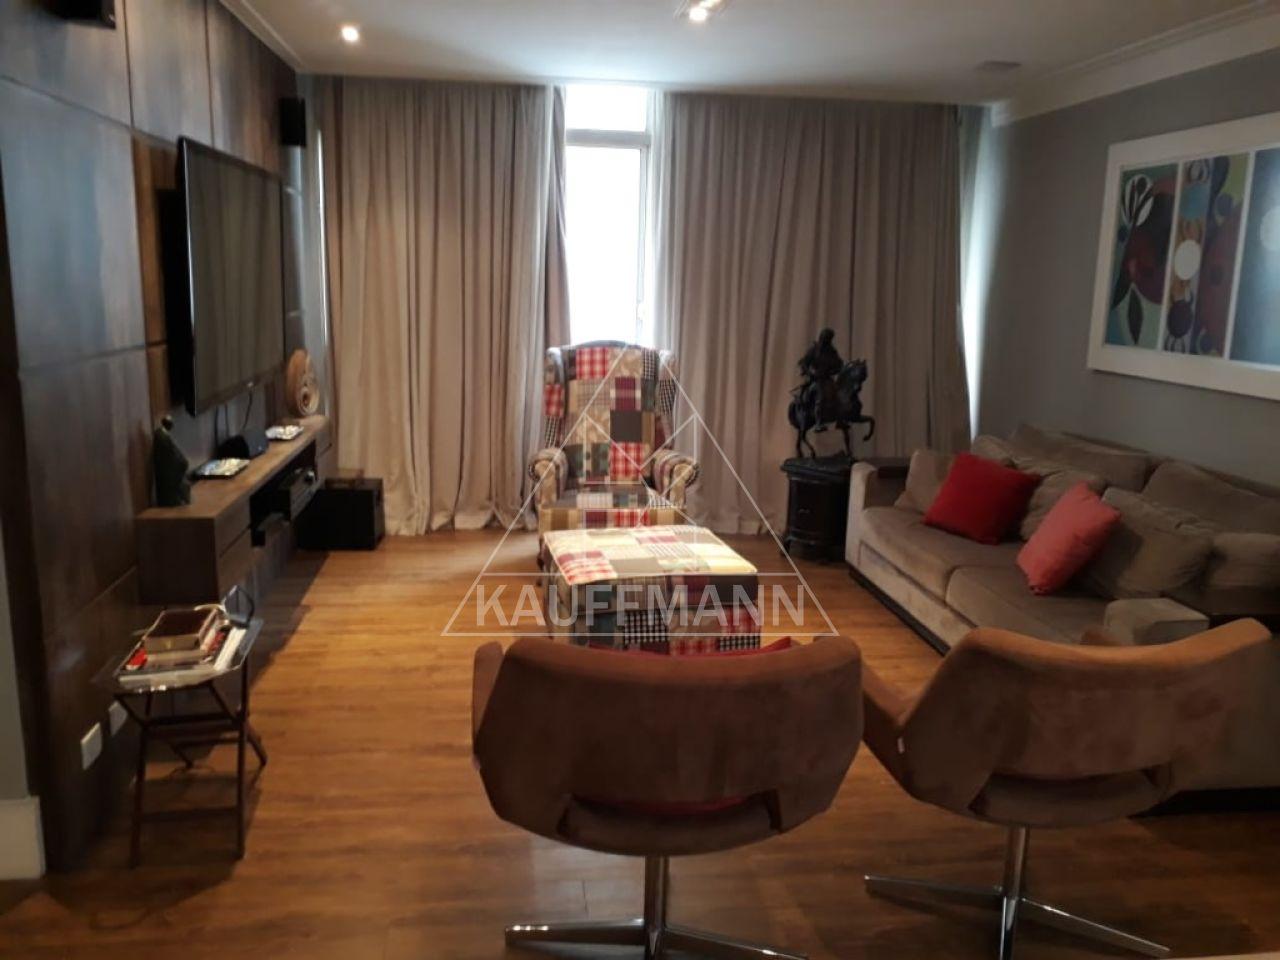 apartamento-venda-sao-paulo-jardim-paulista-3dormitorios-3suites-1vaga-174m2-Foto13